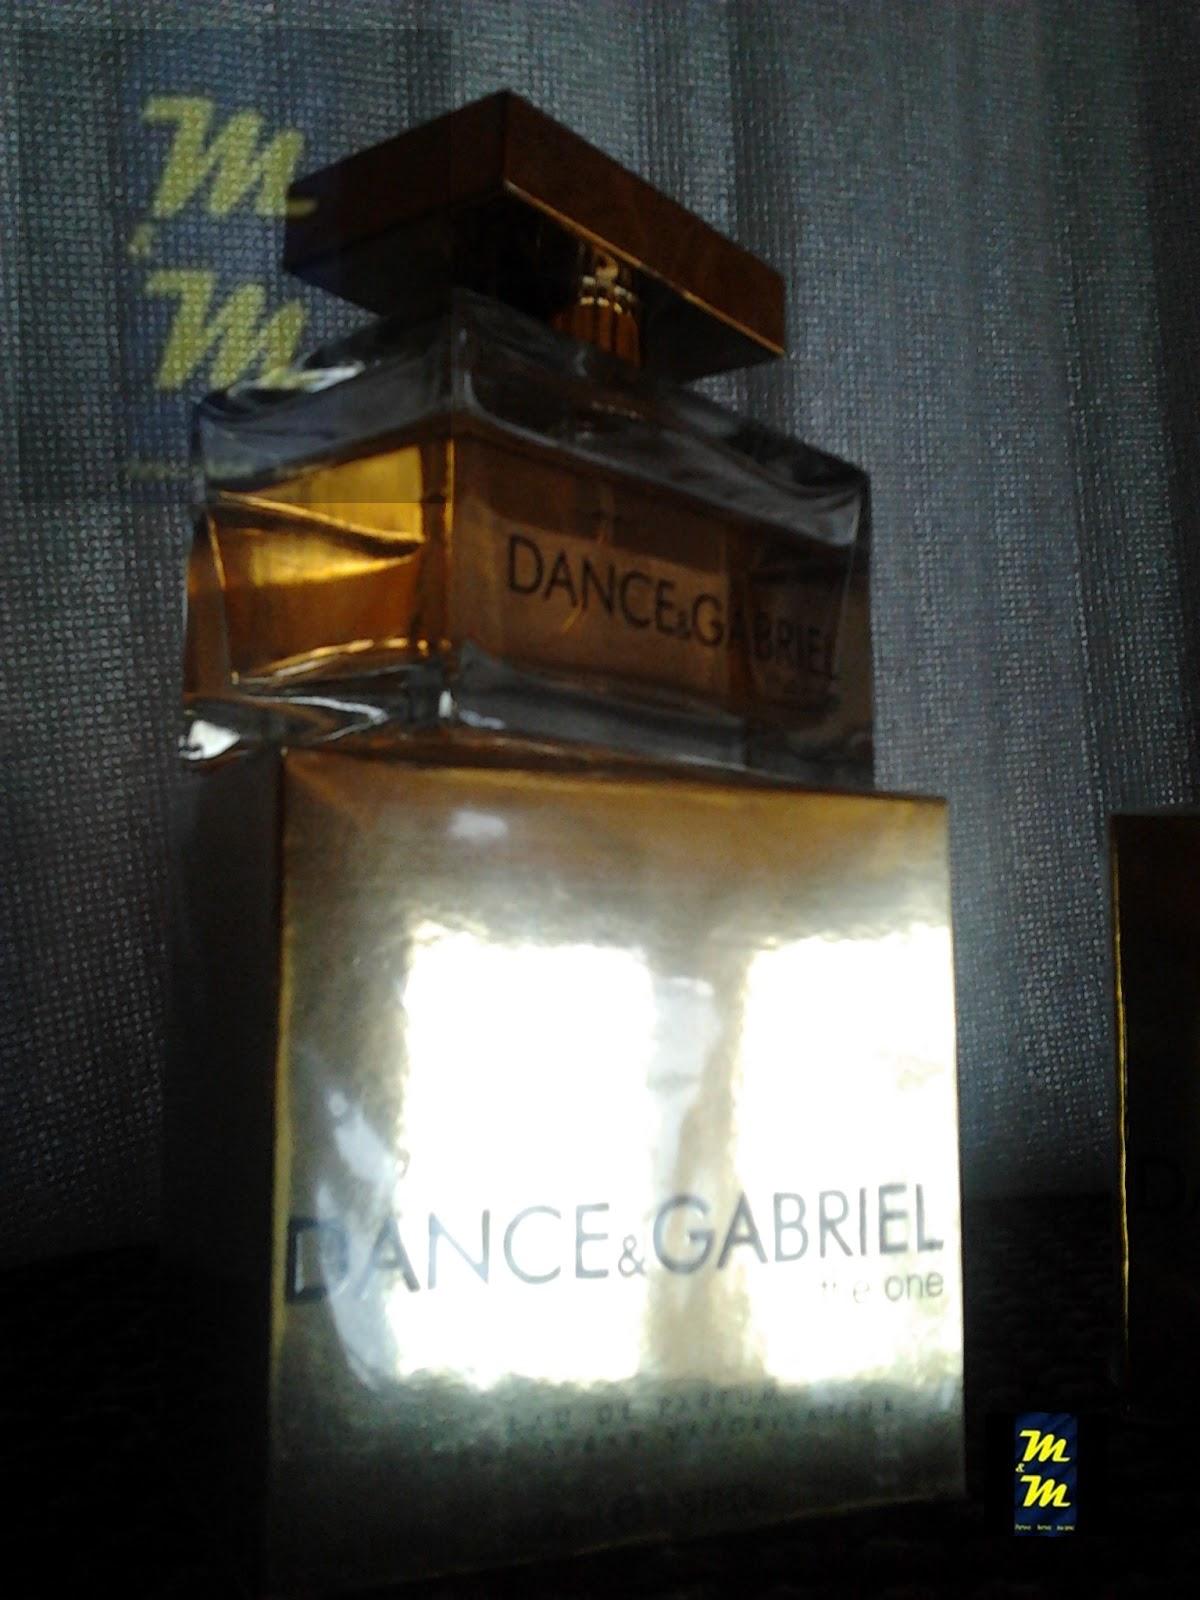 perfume dance&gabriel the one